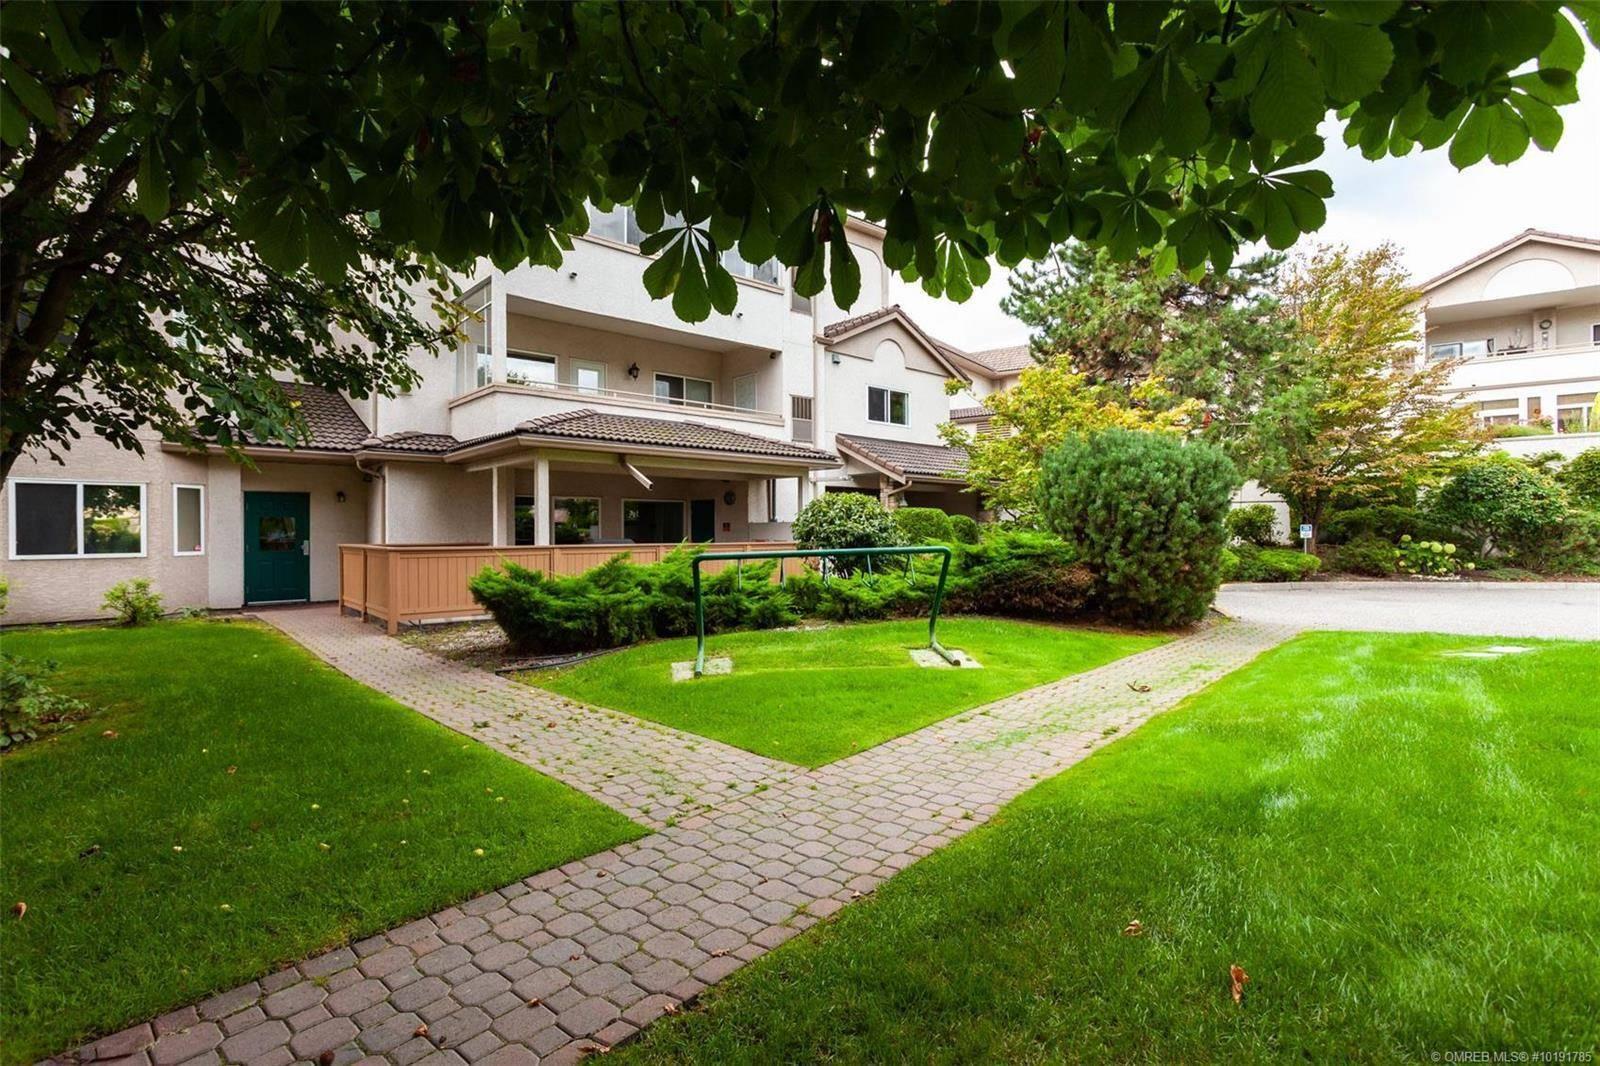 Condo for sale at 2300 Benvoulin Rd Unit 305 Kelowna British Columbia - MLS: 10191785